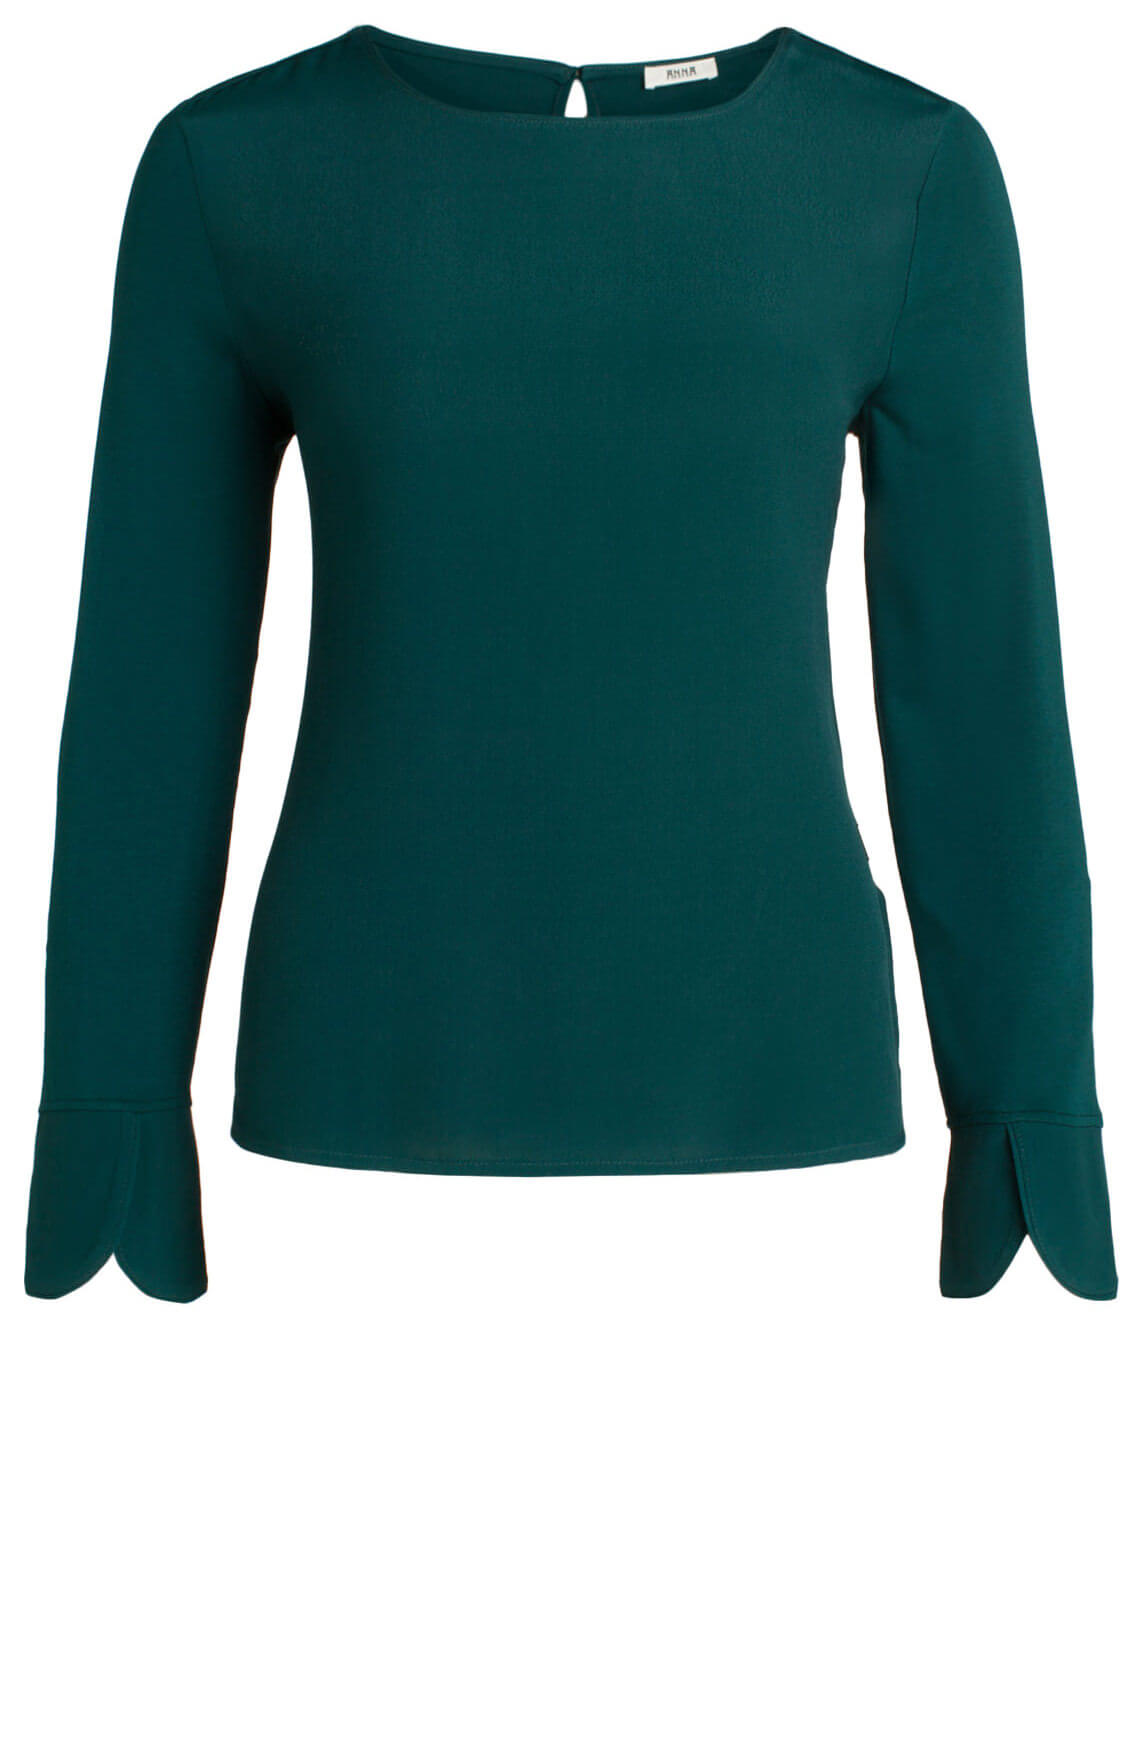 Anna Dames Elegante blouse groen